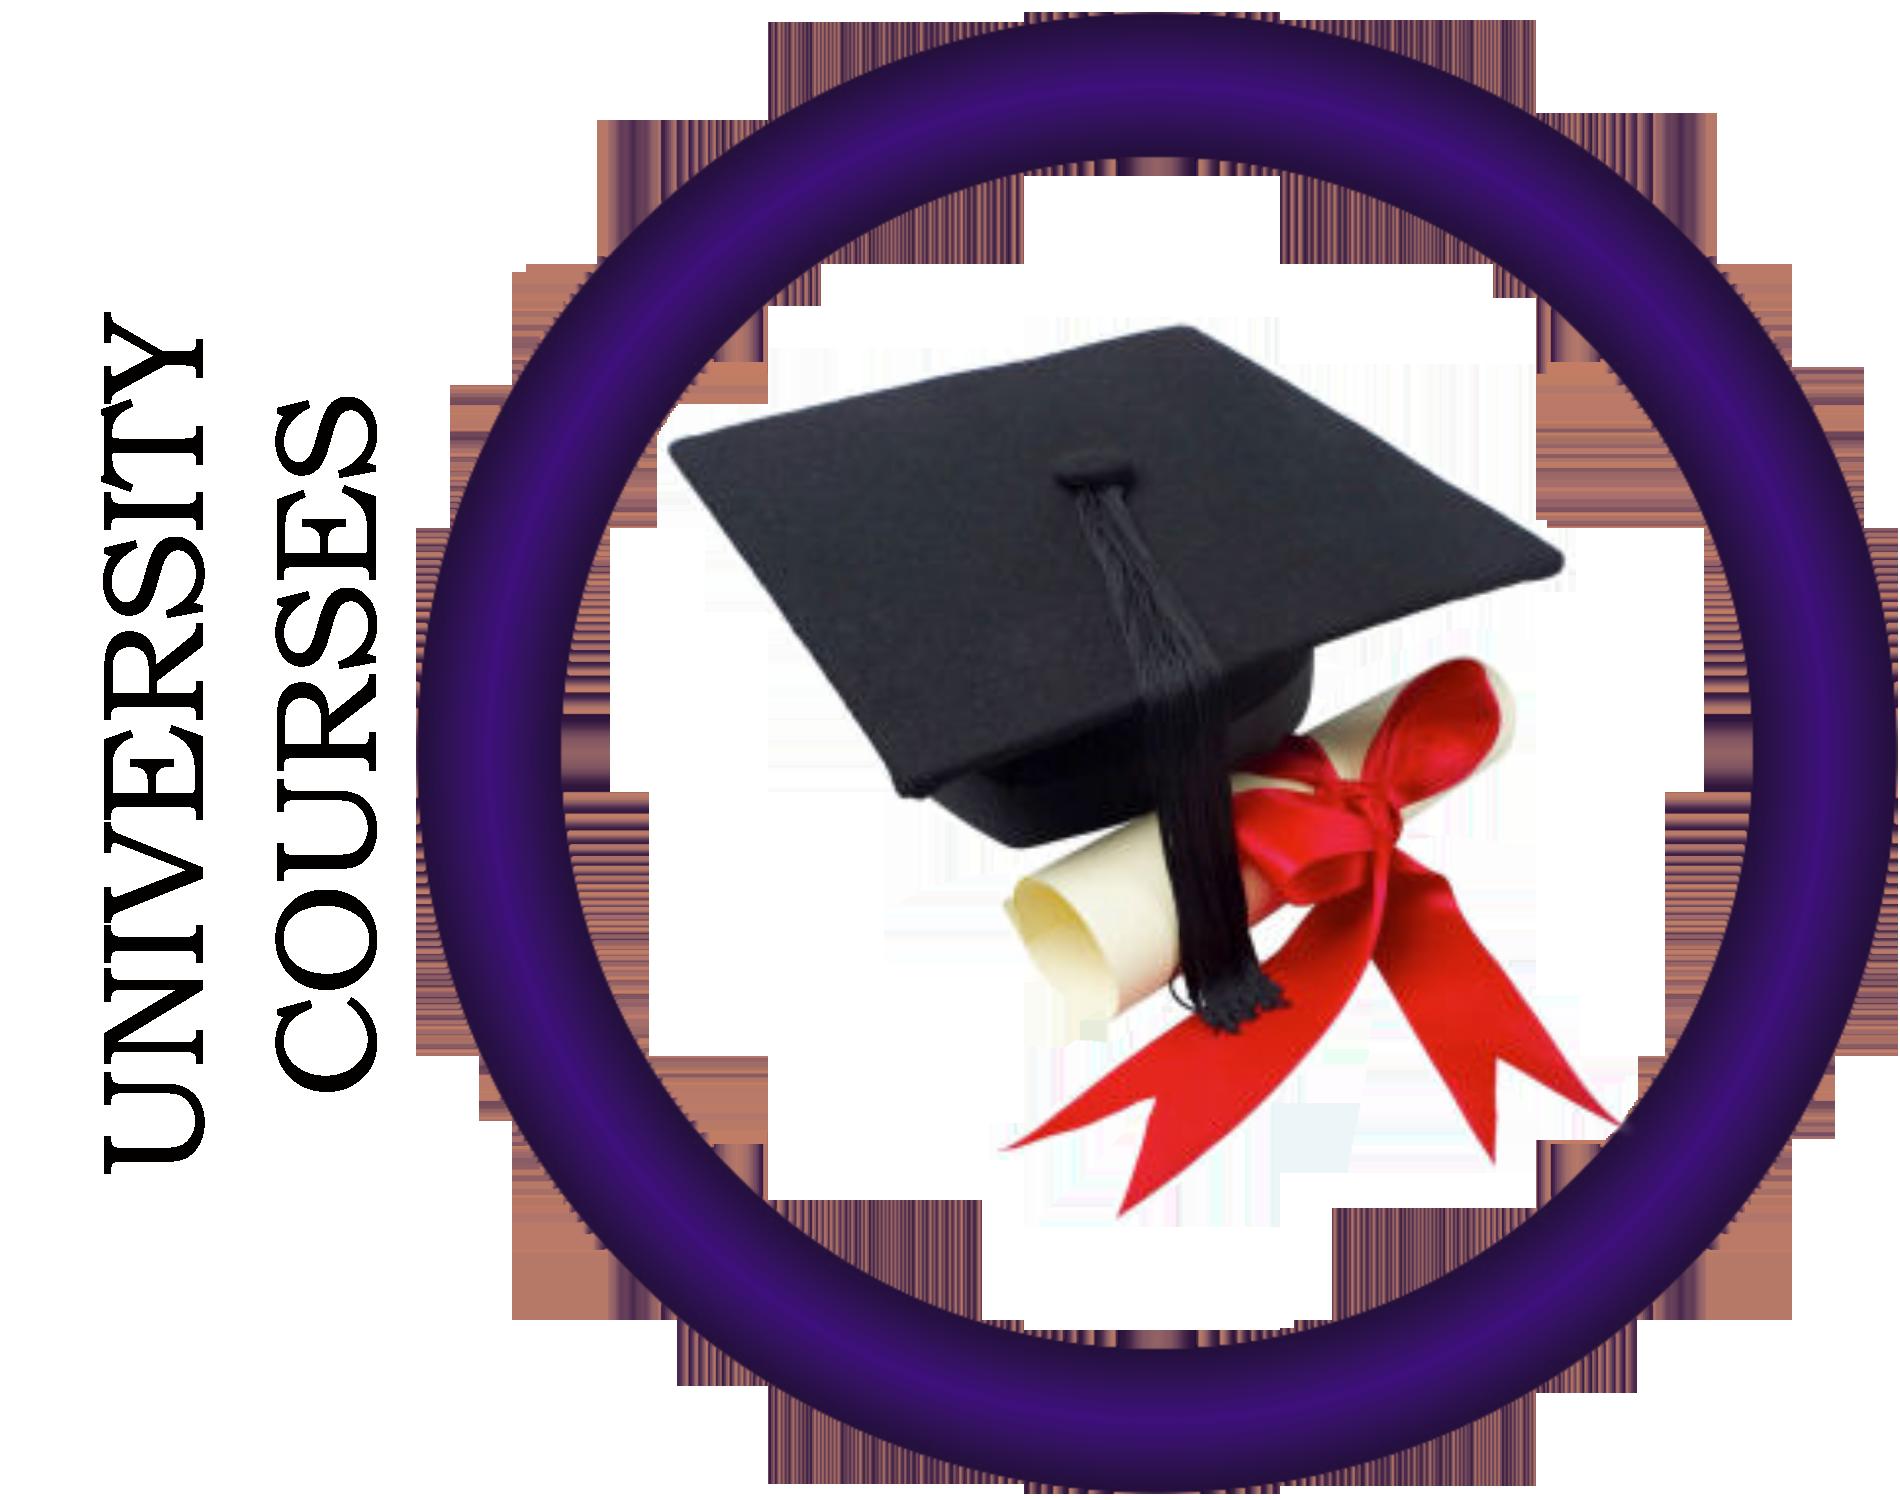 Diploma clipart purple. Swami vivekanand education group